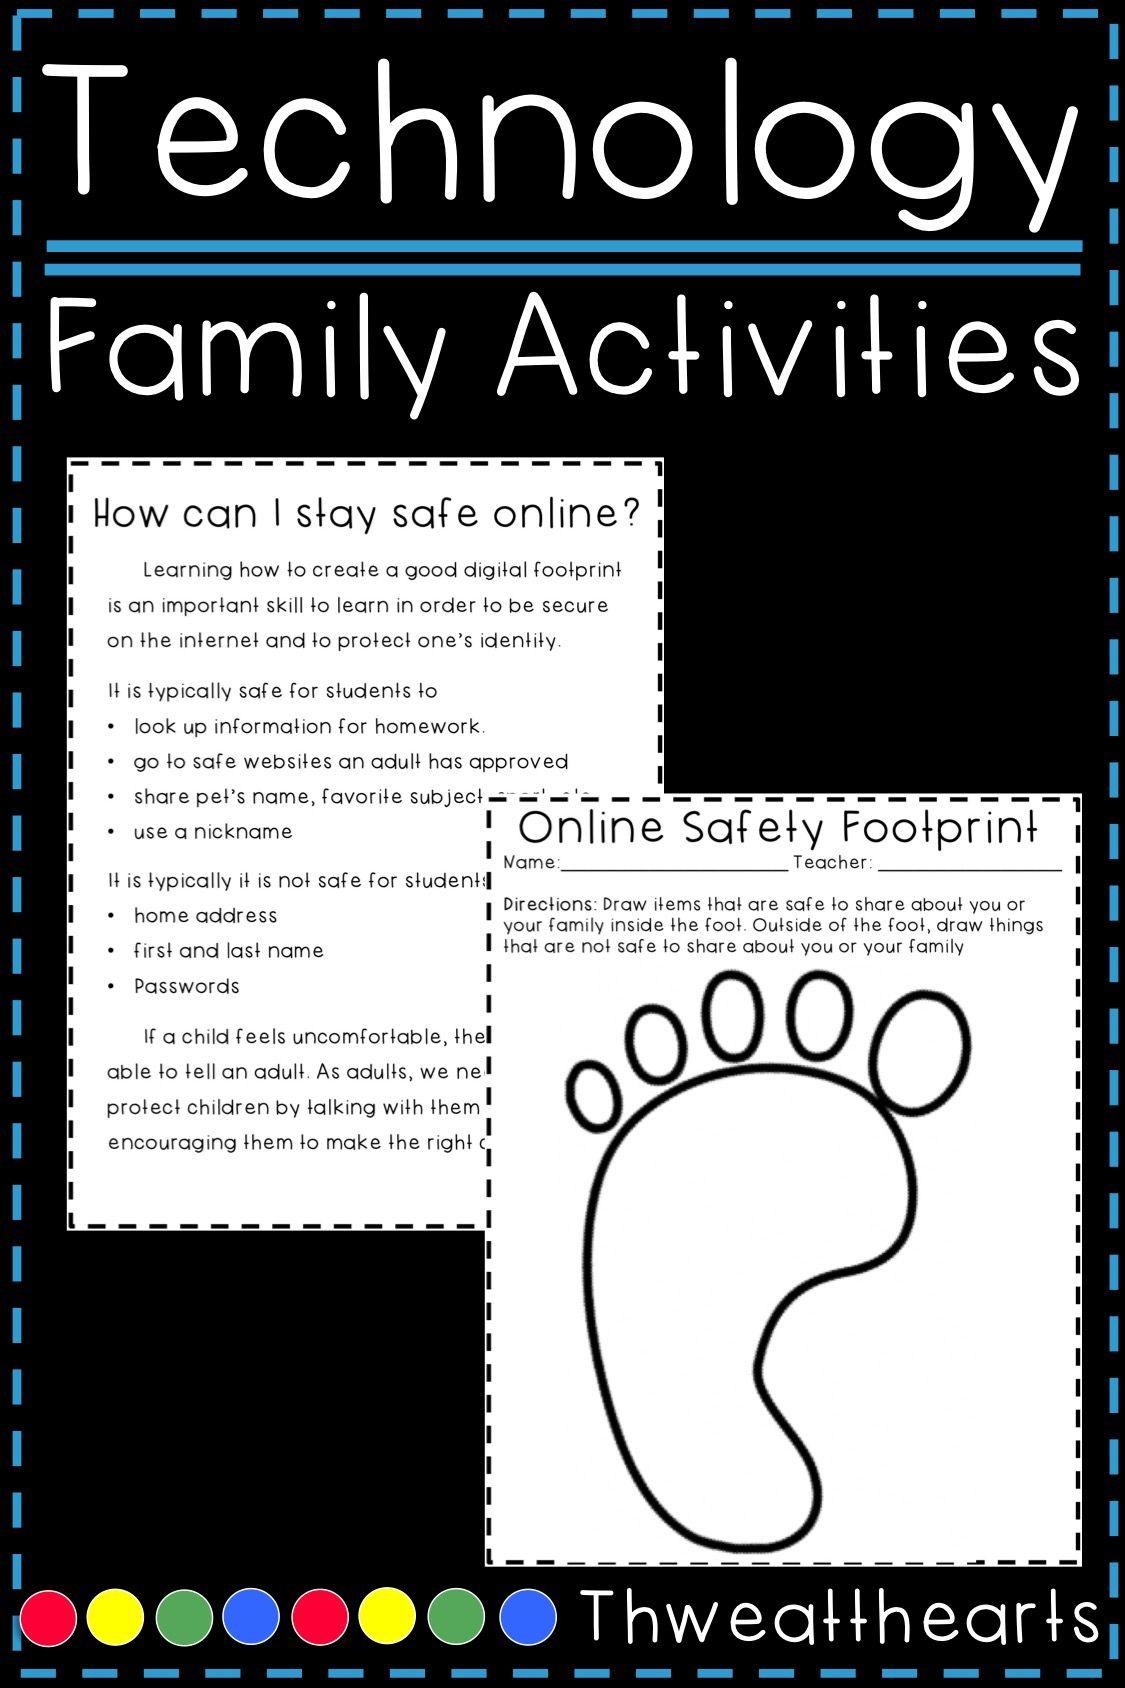 Technology Family Activities